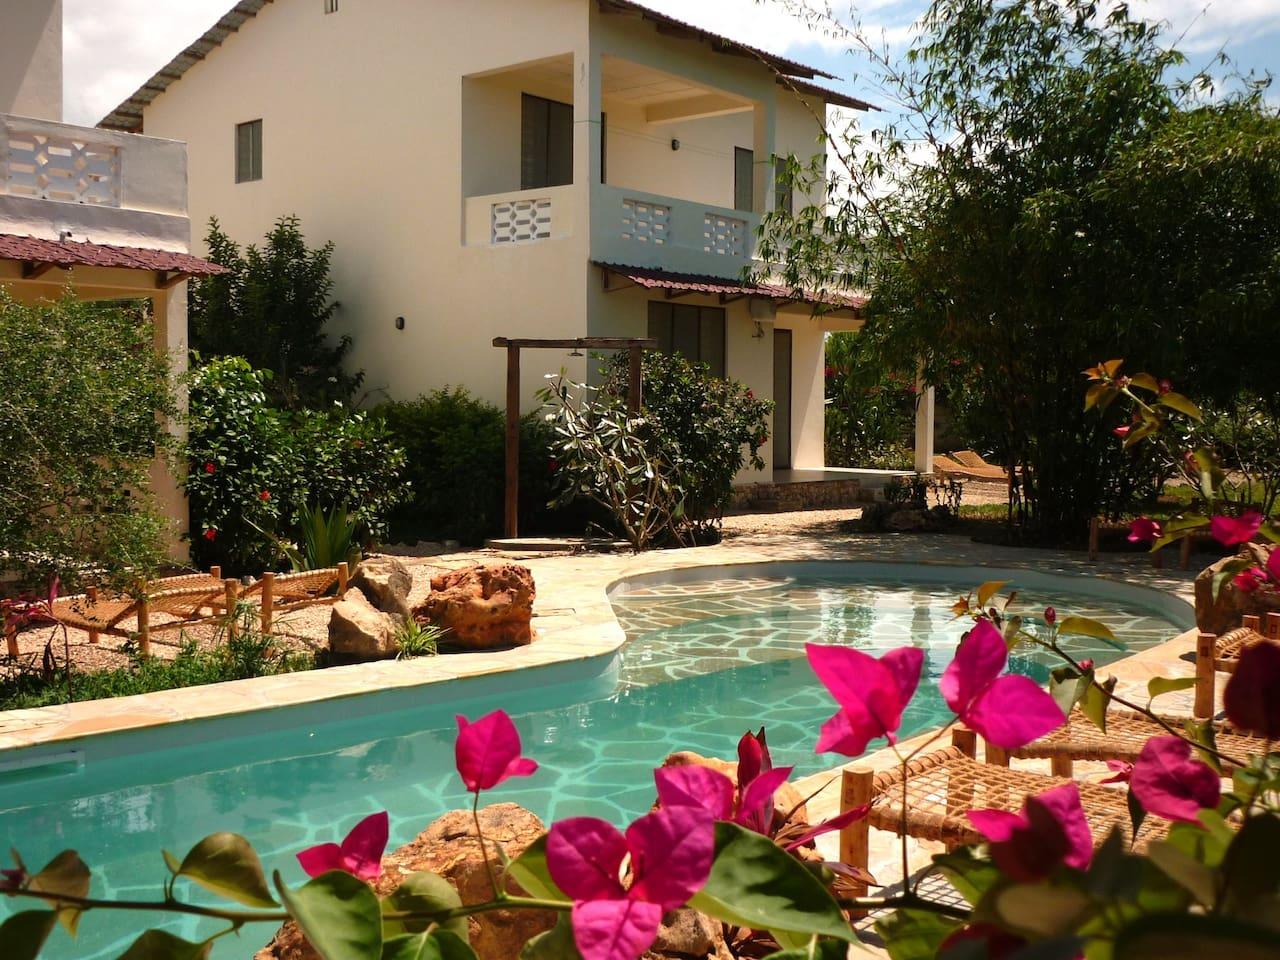 Casa Habari by the Pool